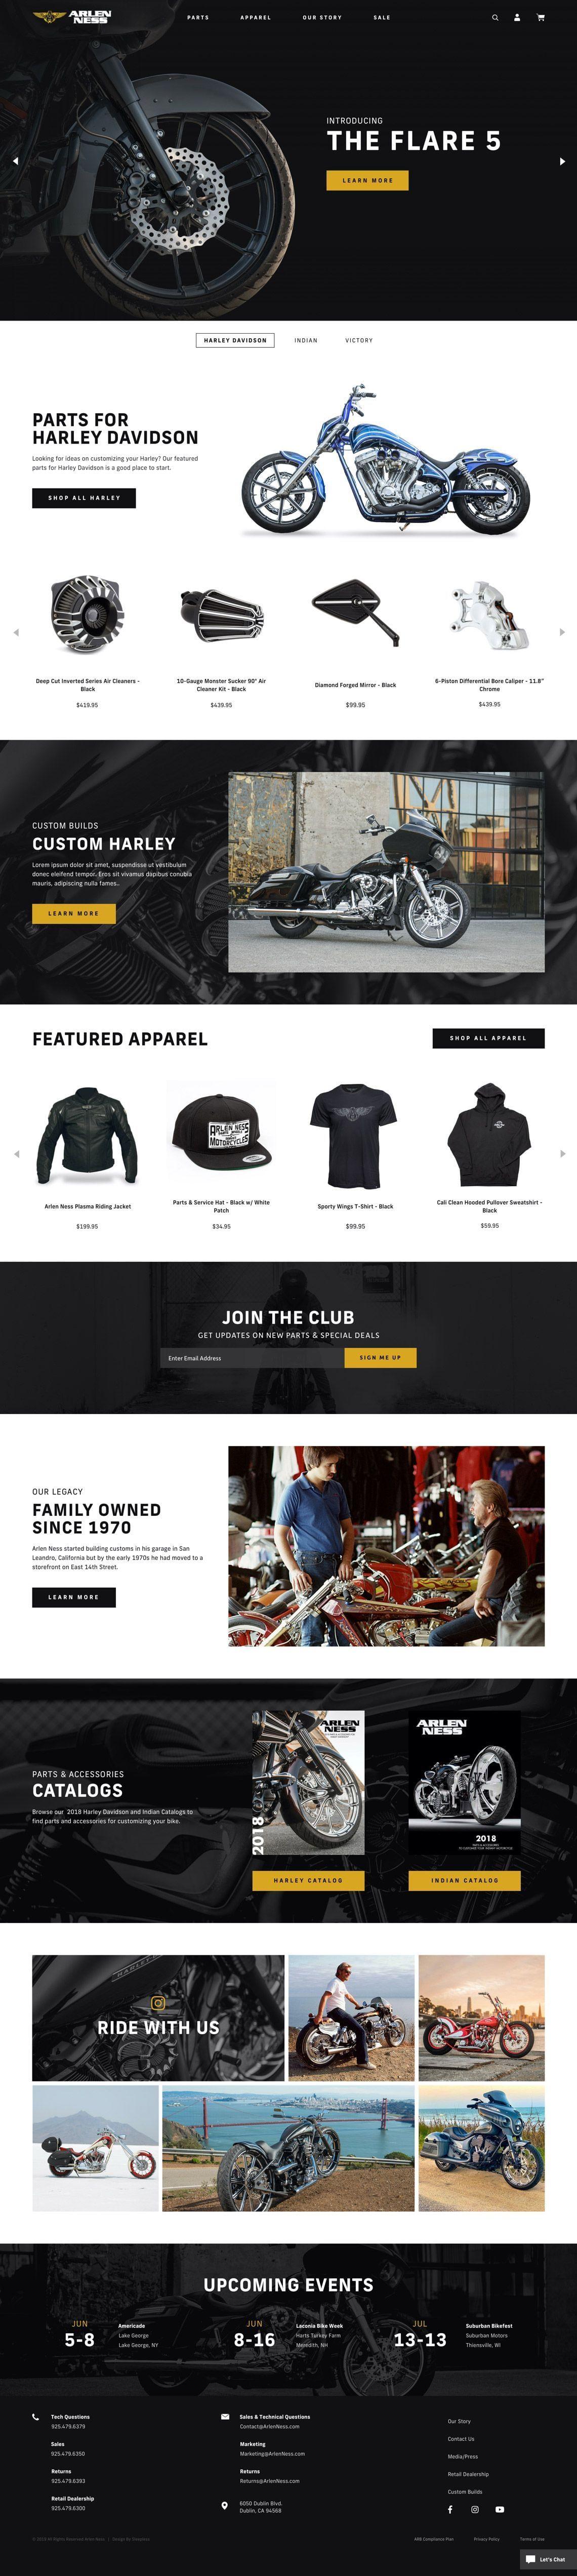 Arlen Ness Homepage